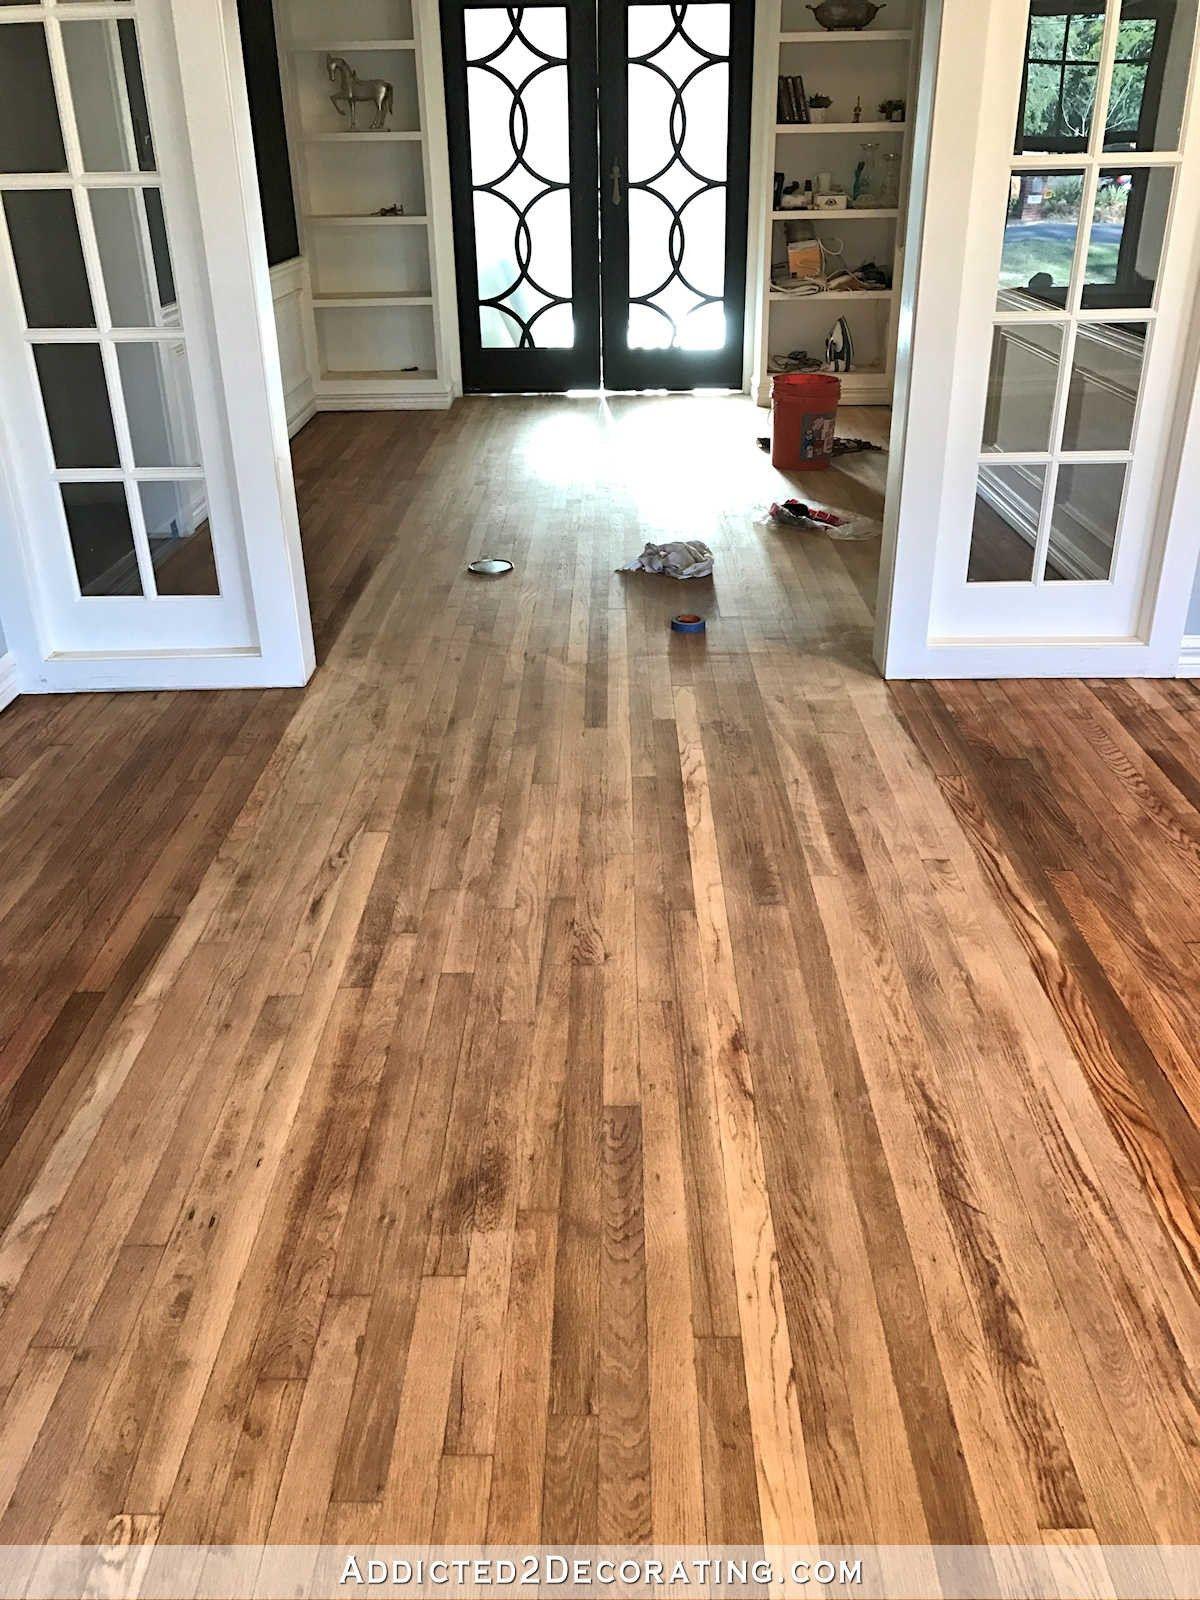 23 Fabulous Estimated Cost Of Installing Hardwood Floors